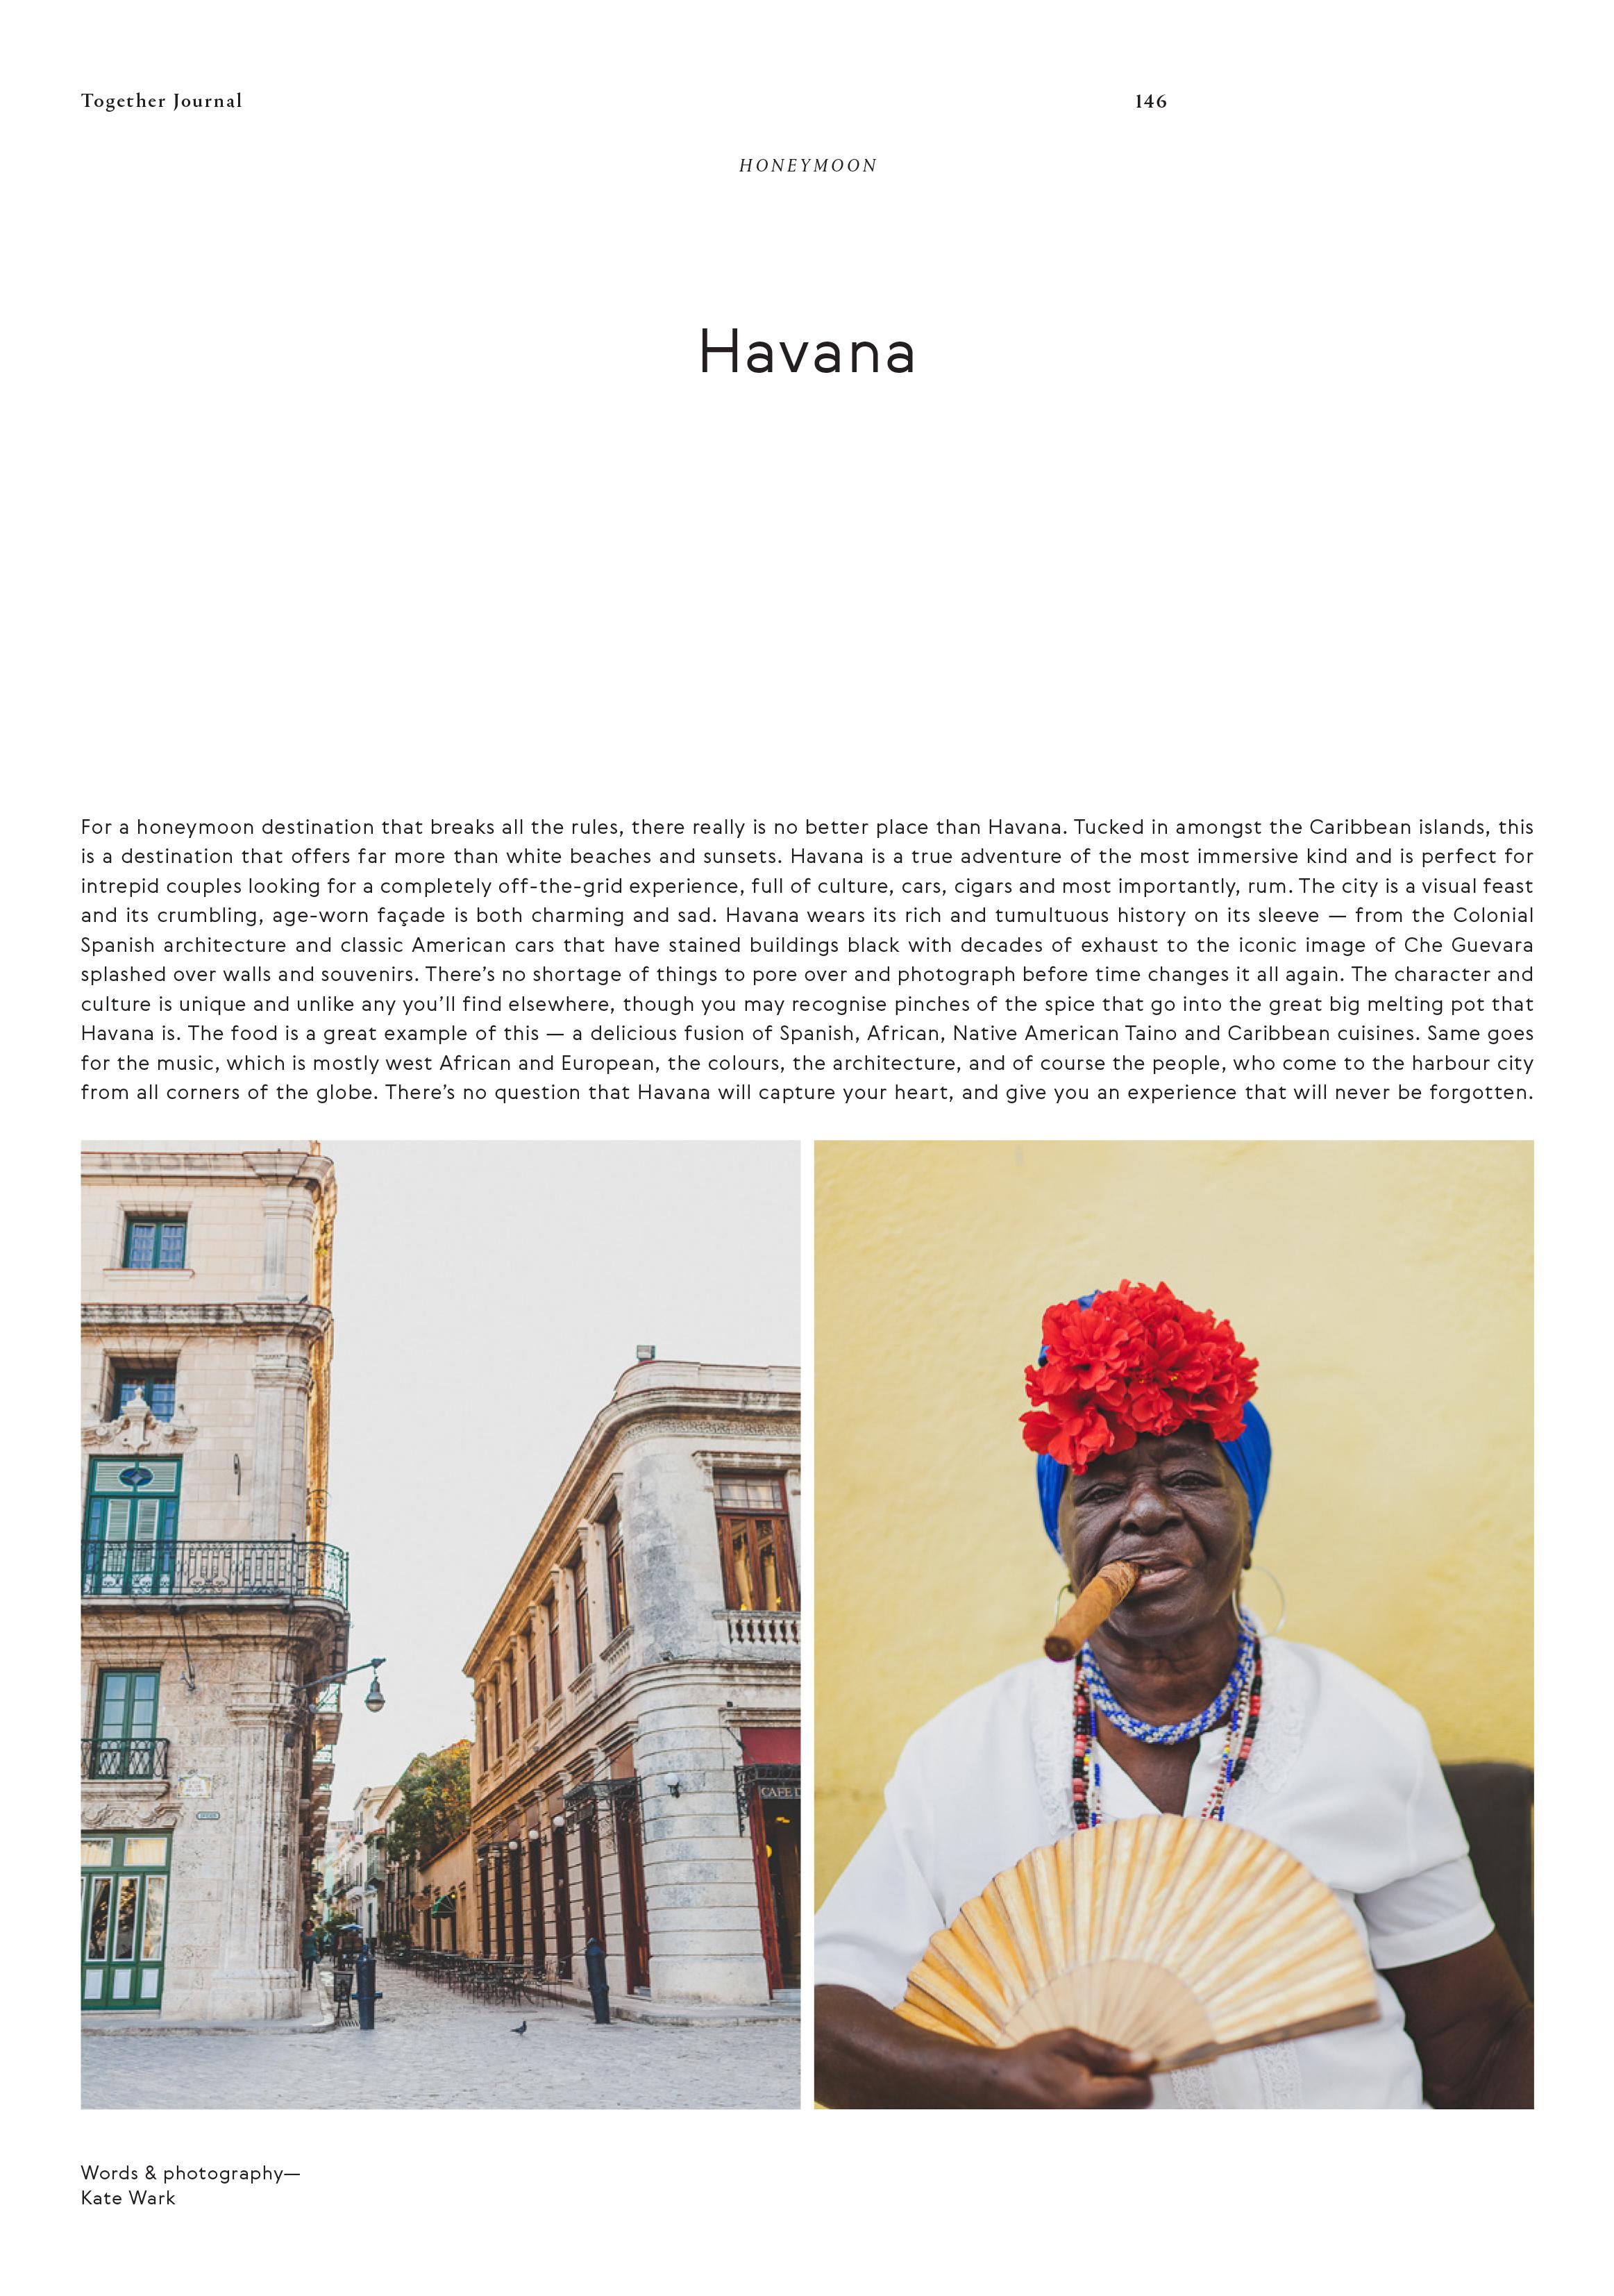 Honeymoon_Havana-1